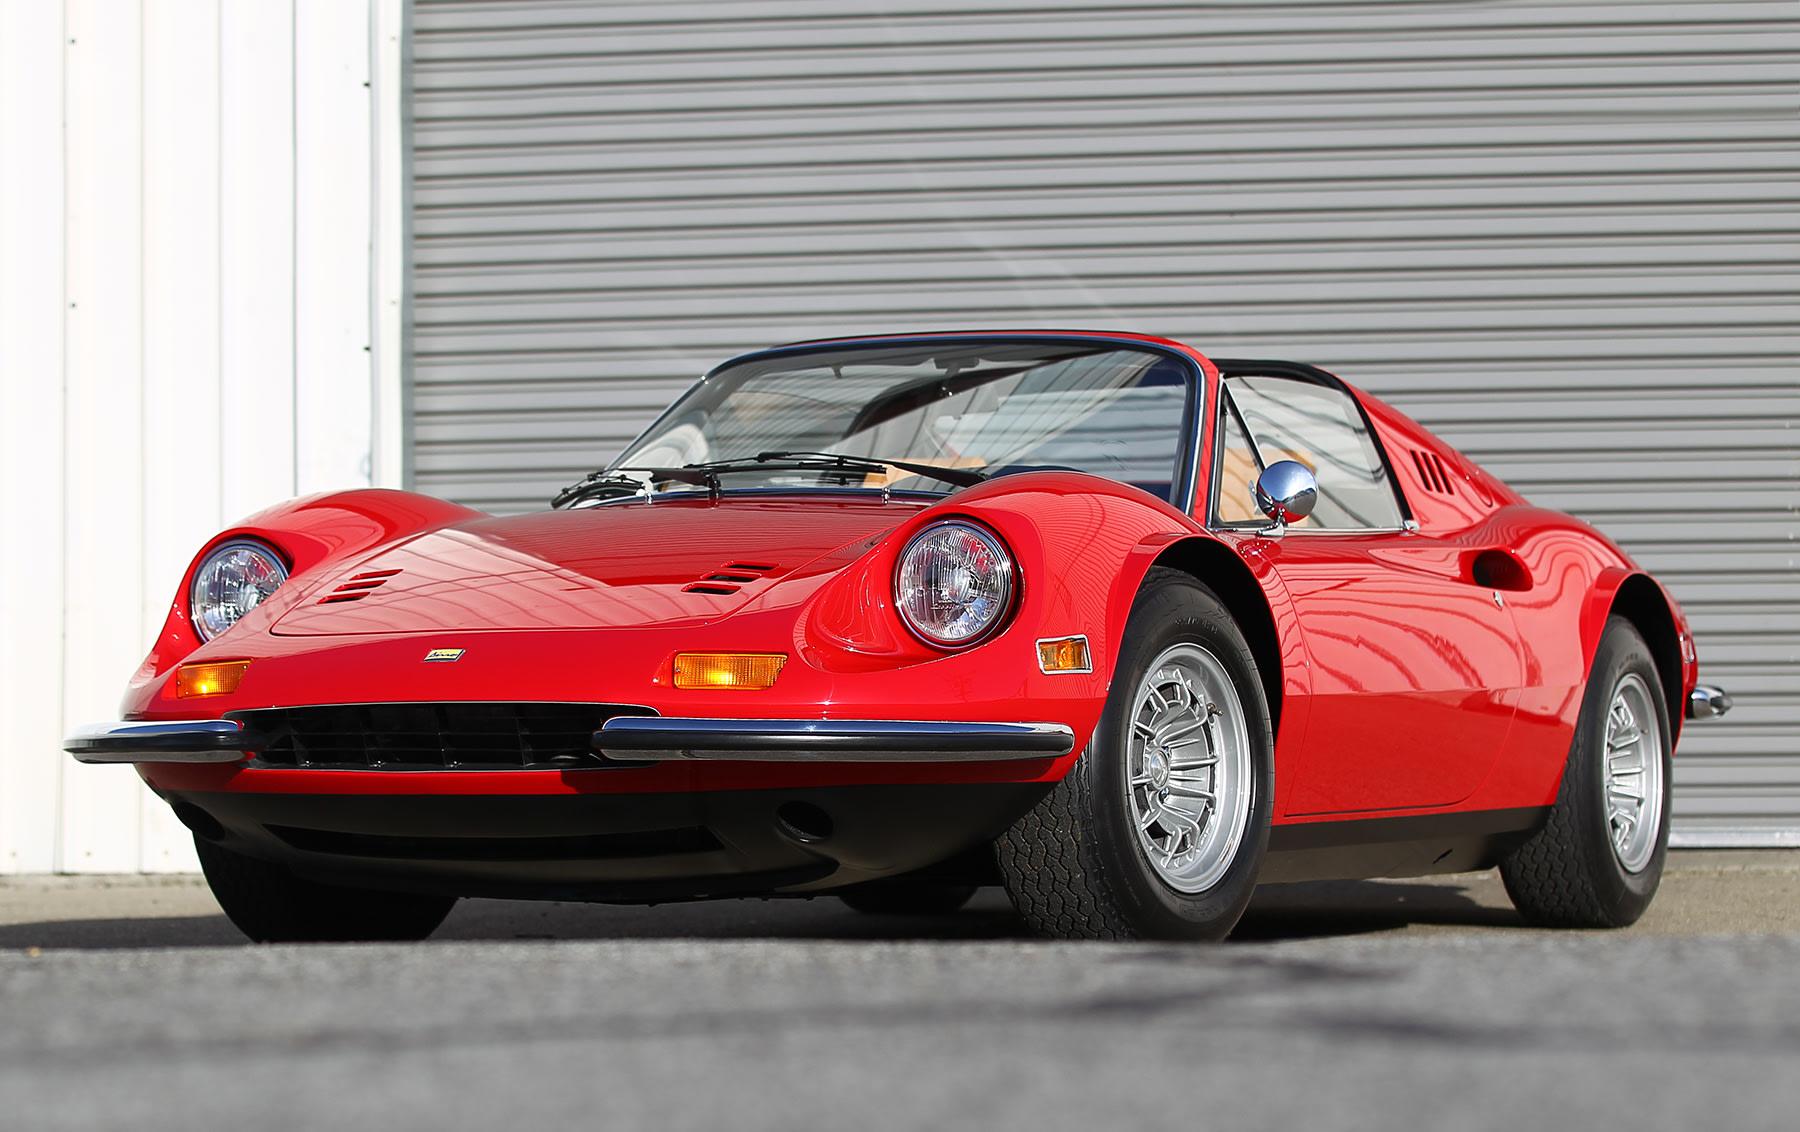 1973 Ferrari Dino 246 GTS(2)